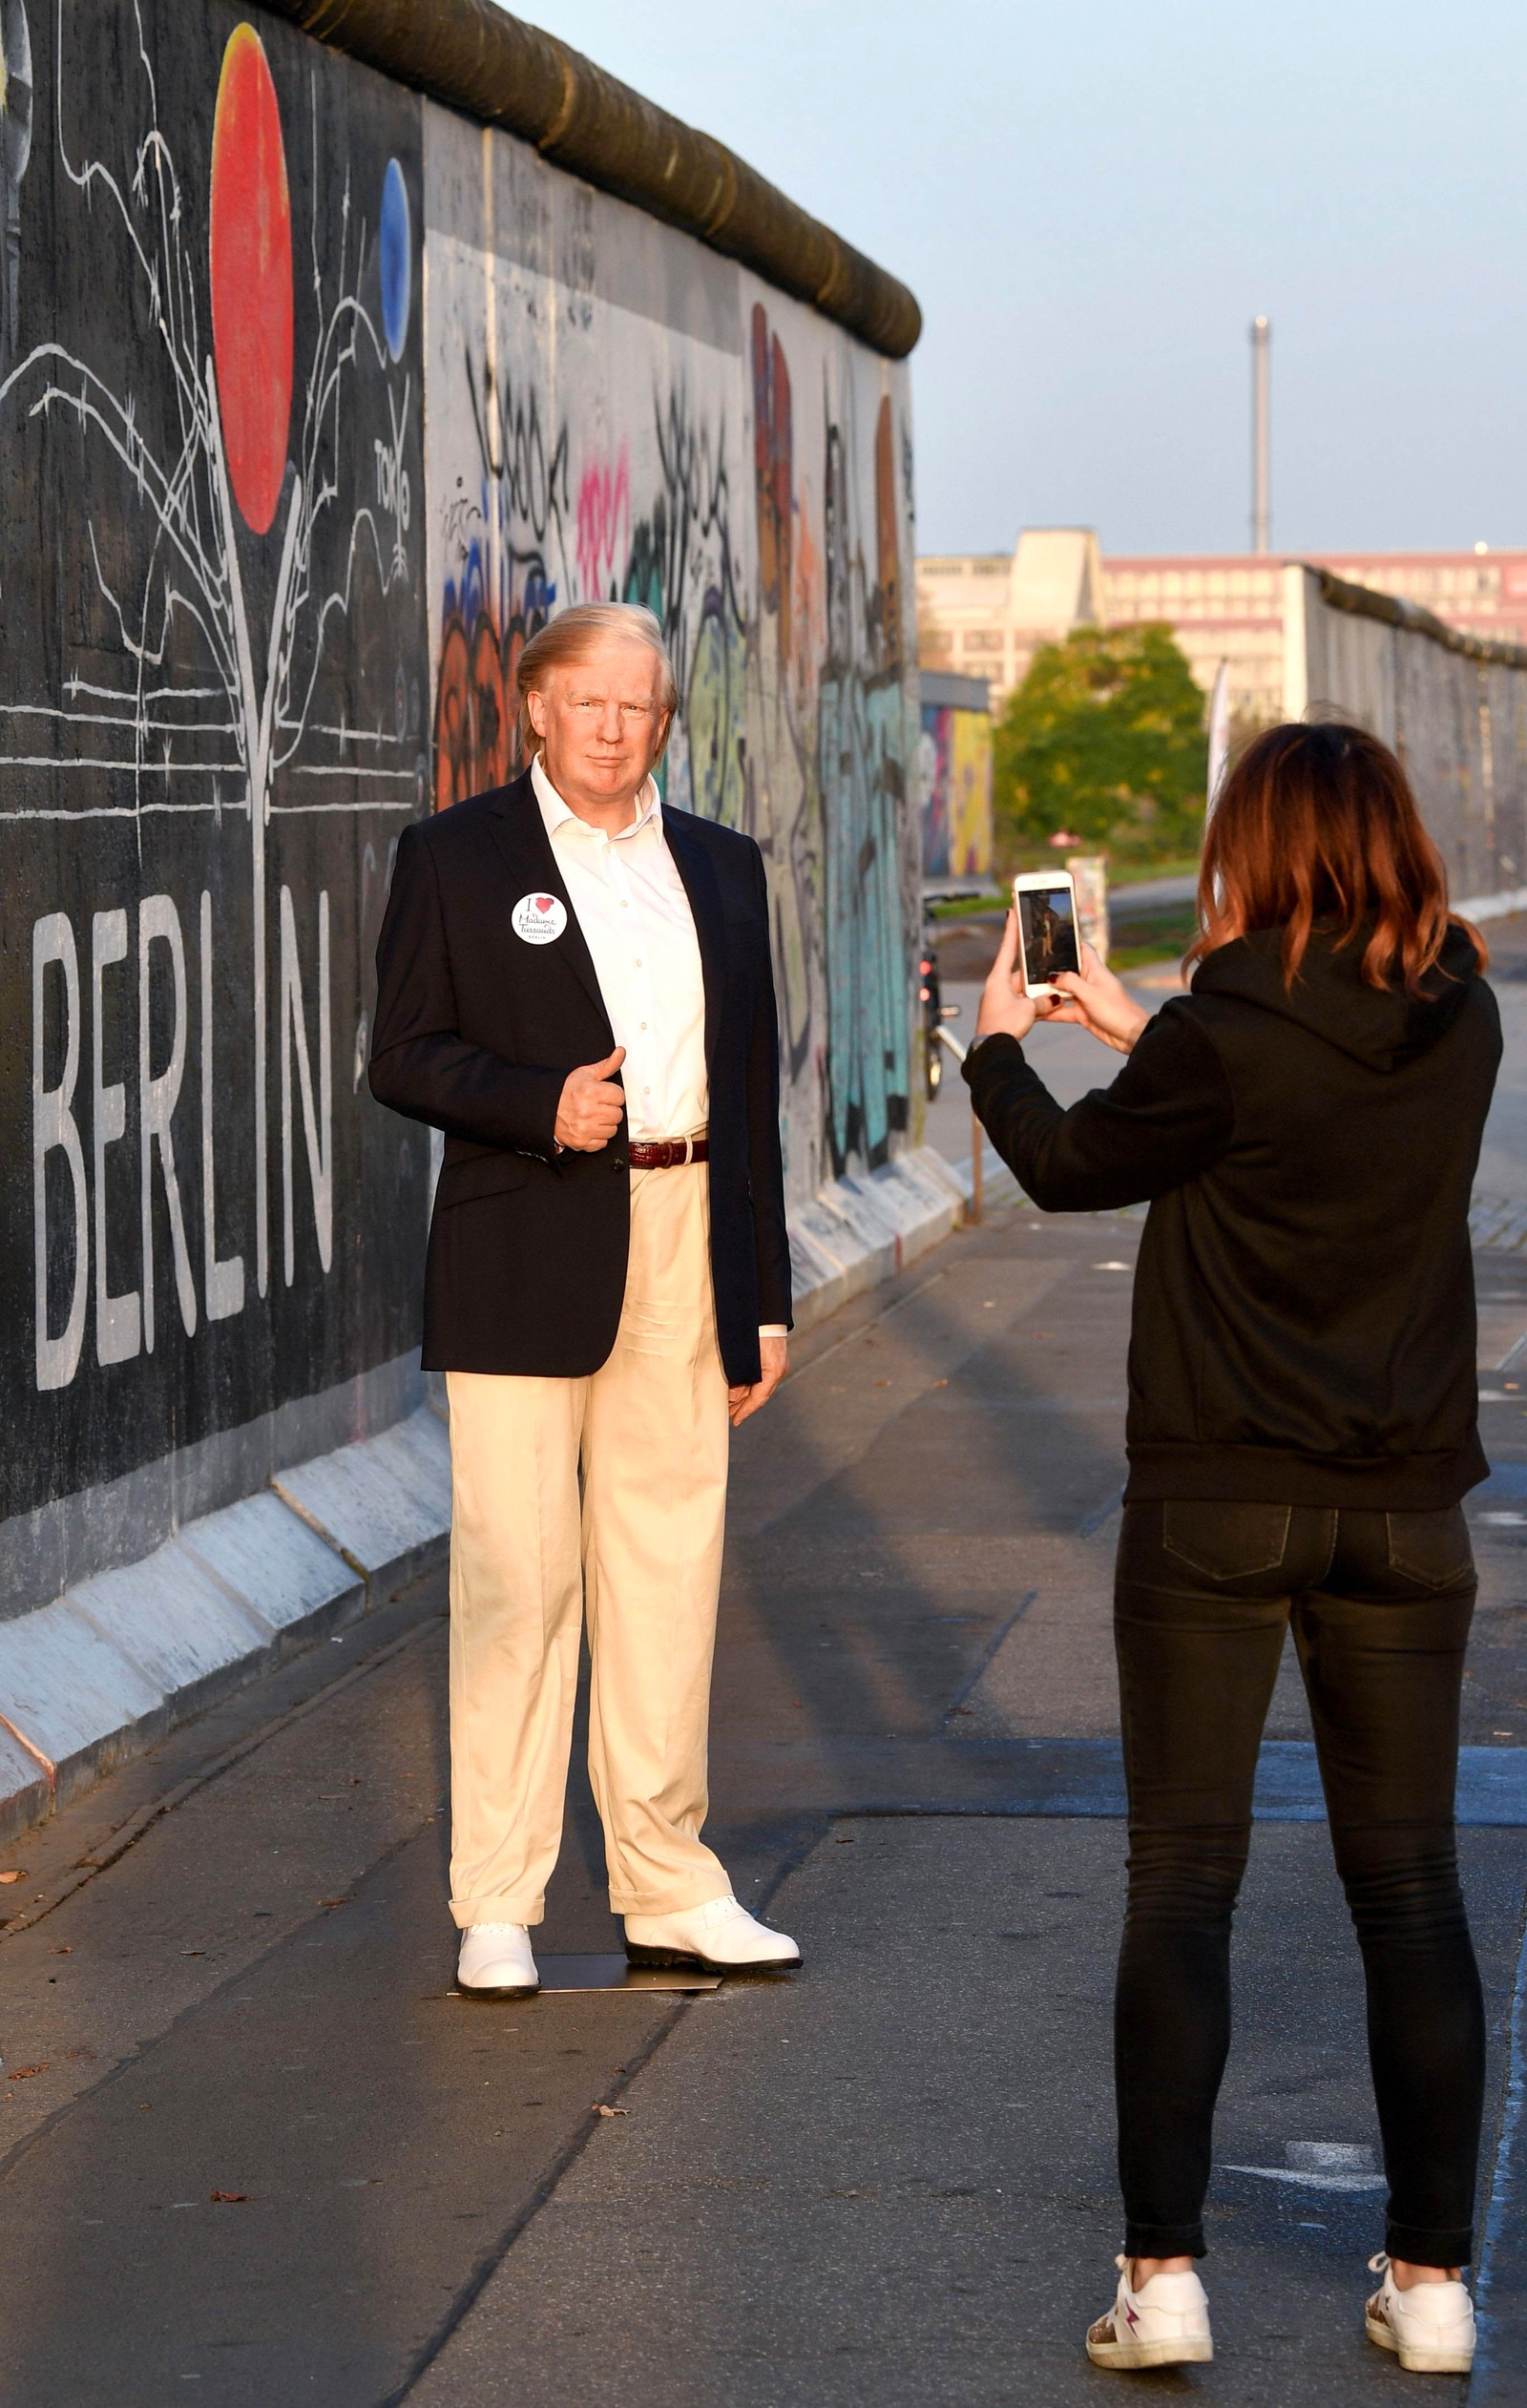 Denne voksdukken, som forestiller Donald Trump, skal stilles ut på Madame Tussauds i Berlin.